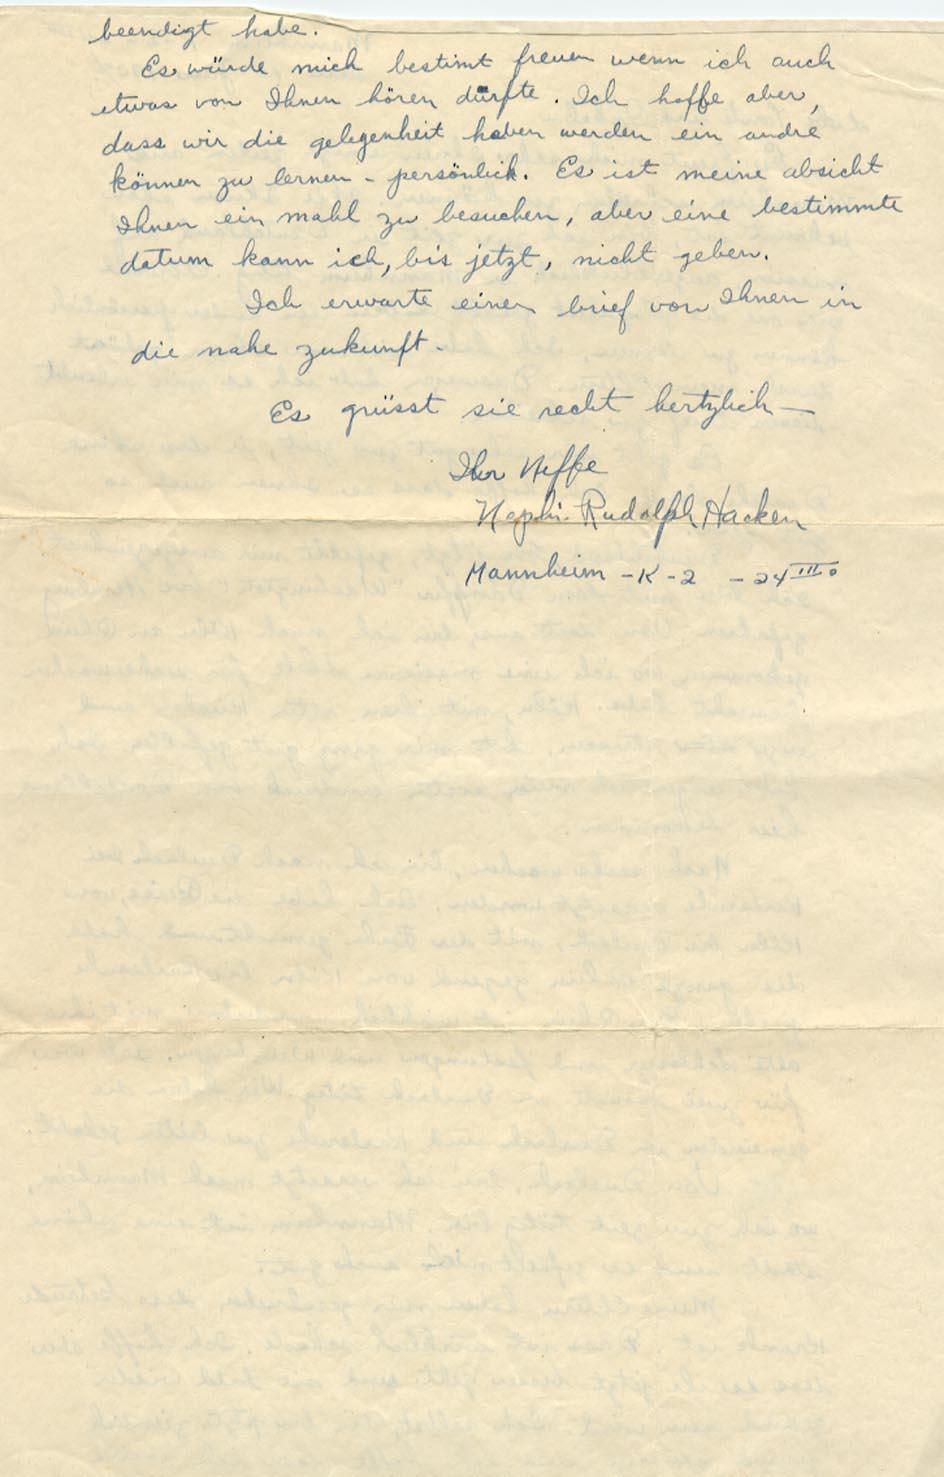 15 January 1934, p. 2